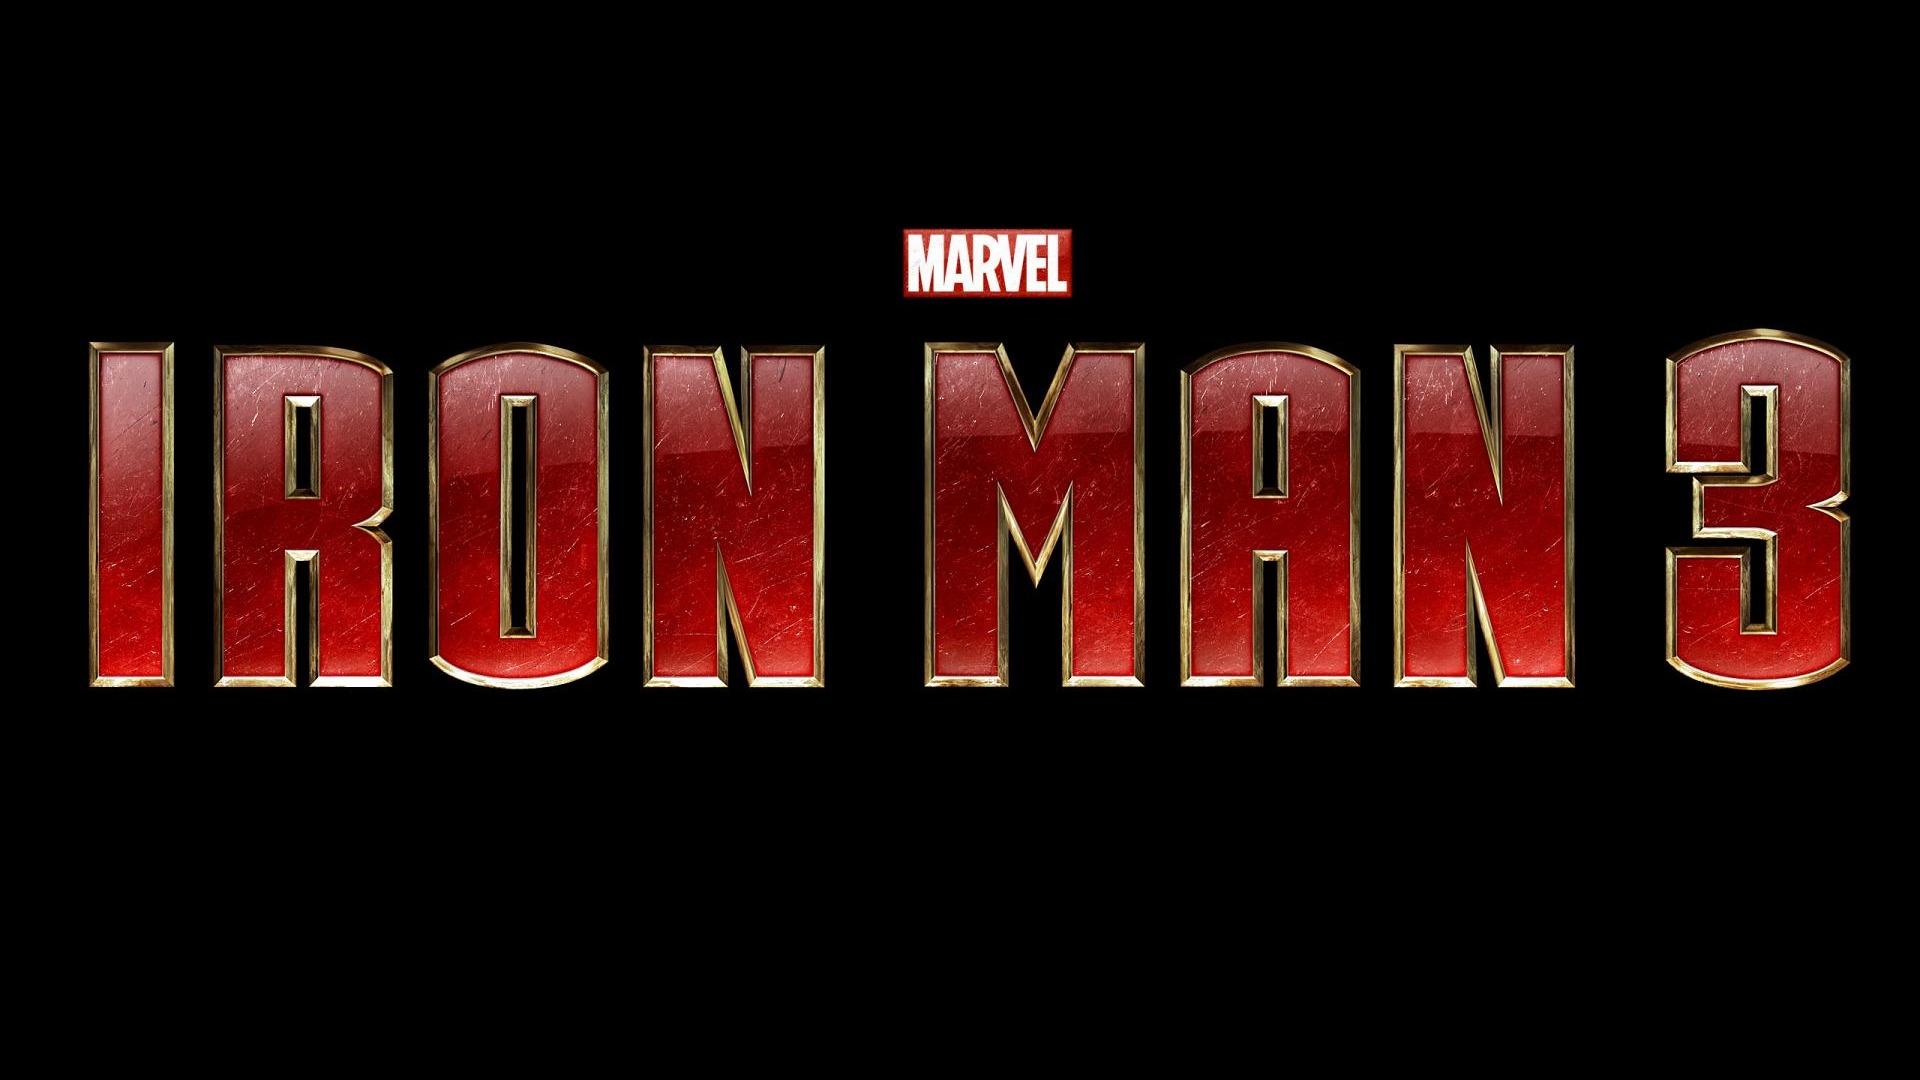 Iron Man 3 wallpaper 2